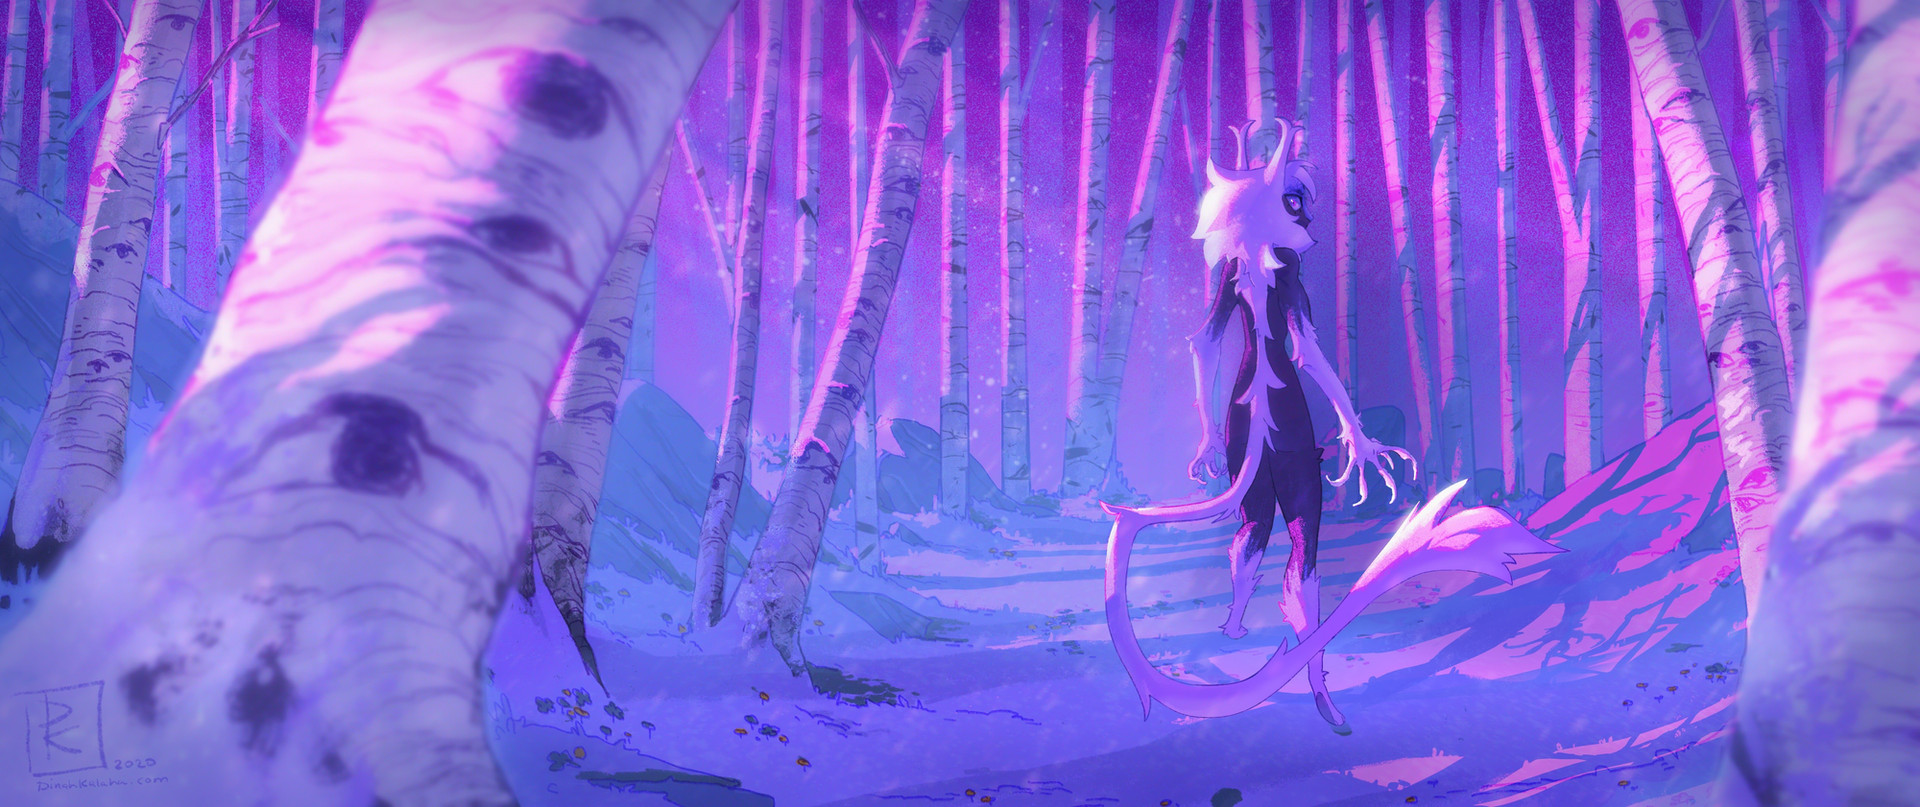 Howl Winter Coat Painting